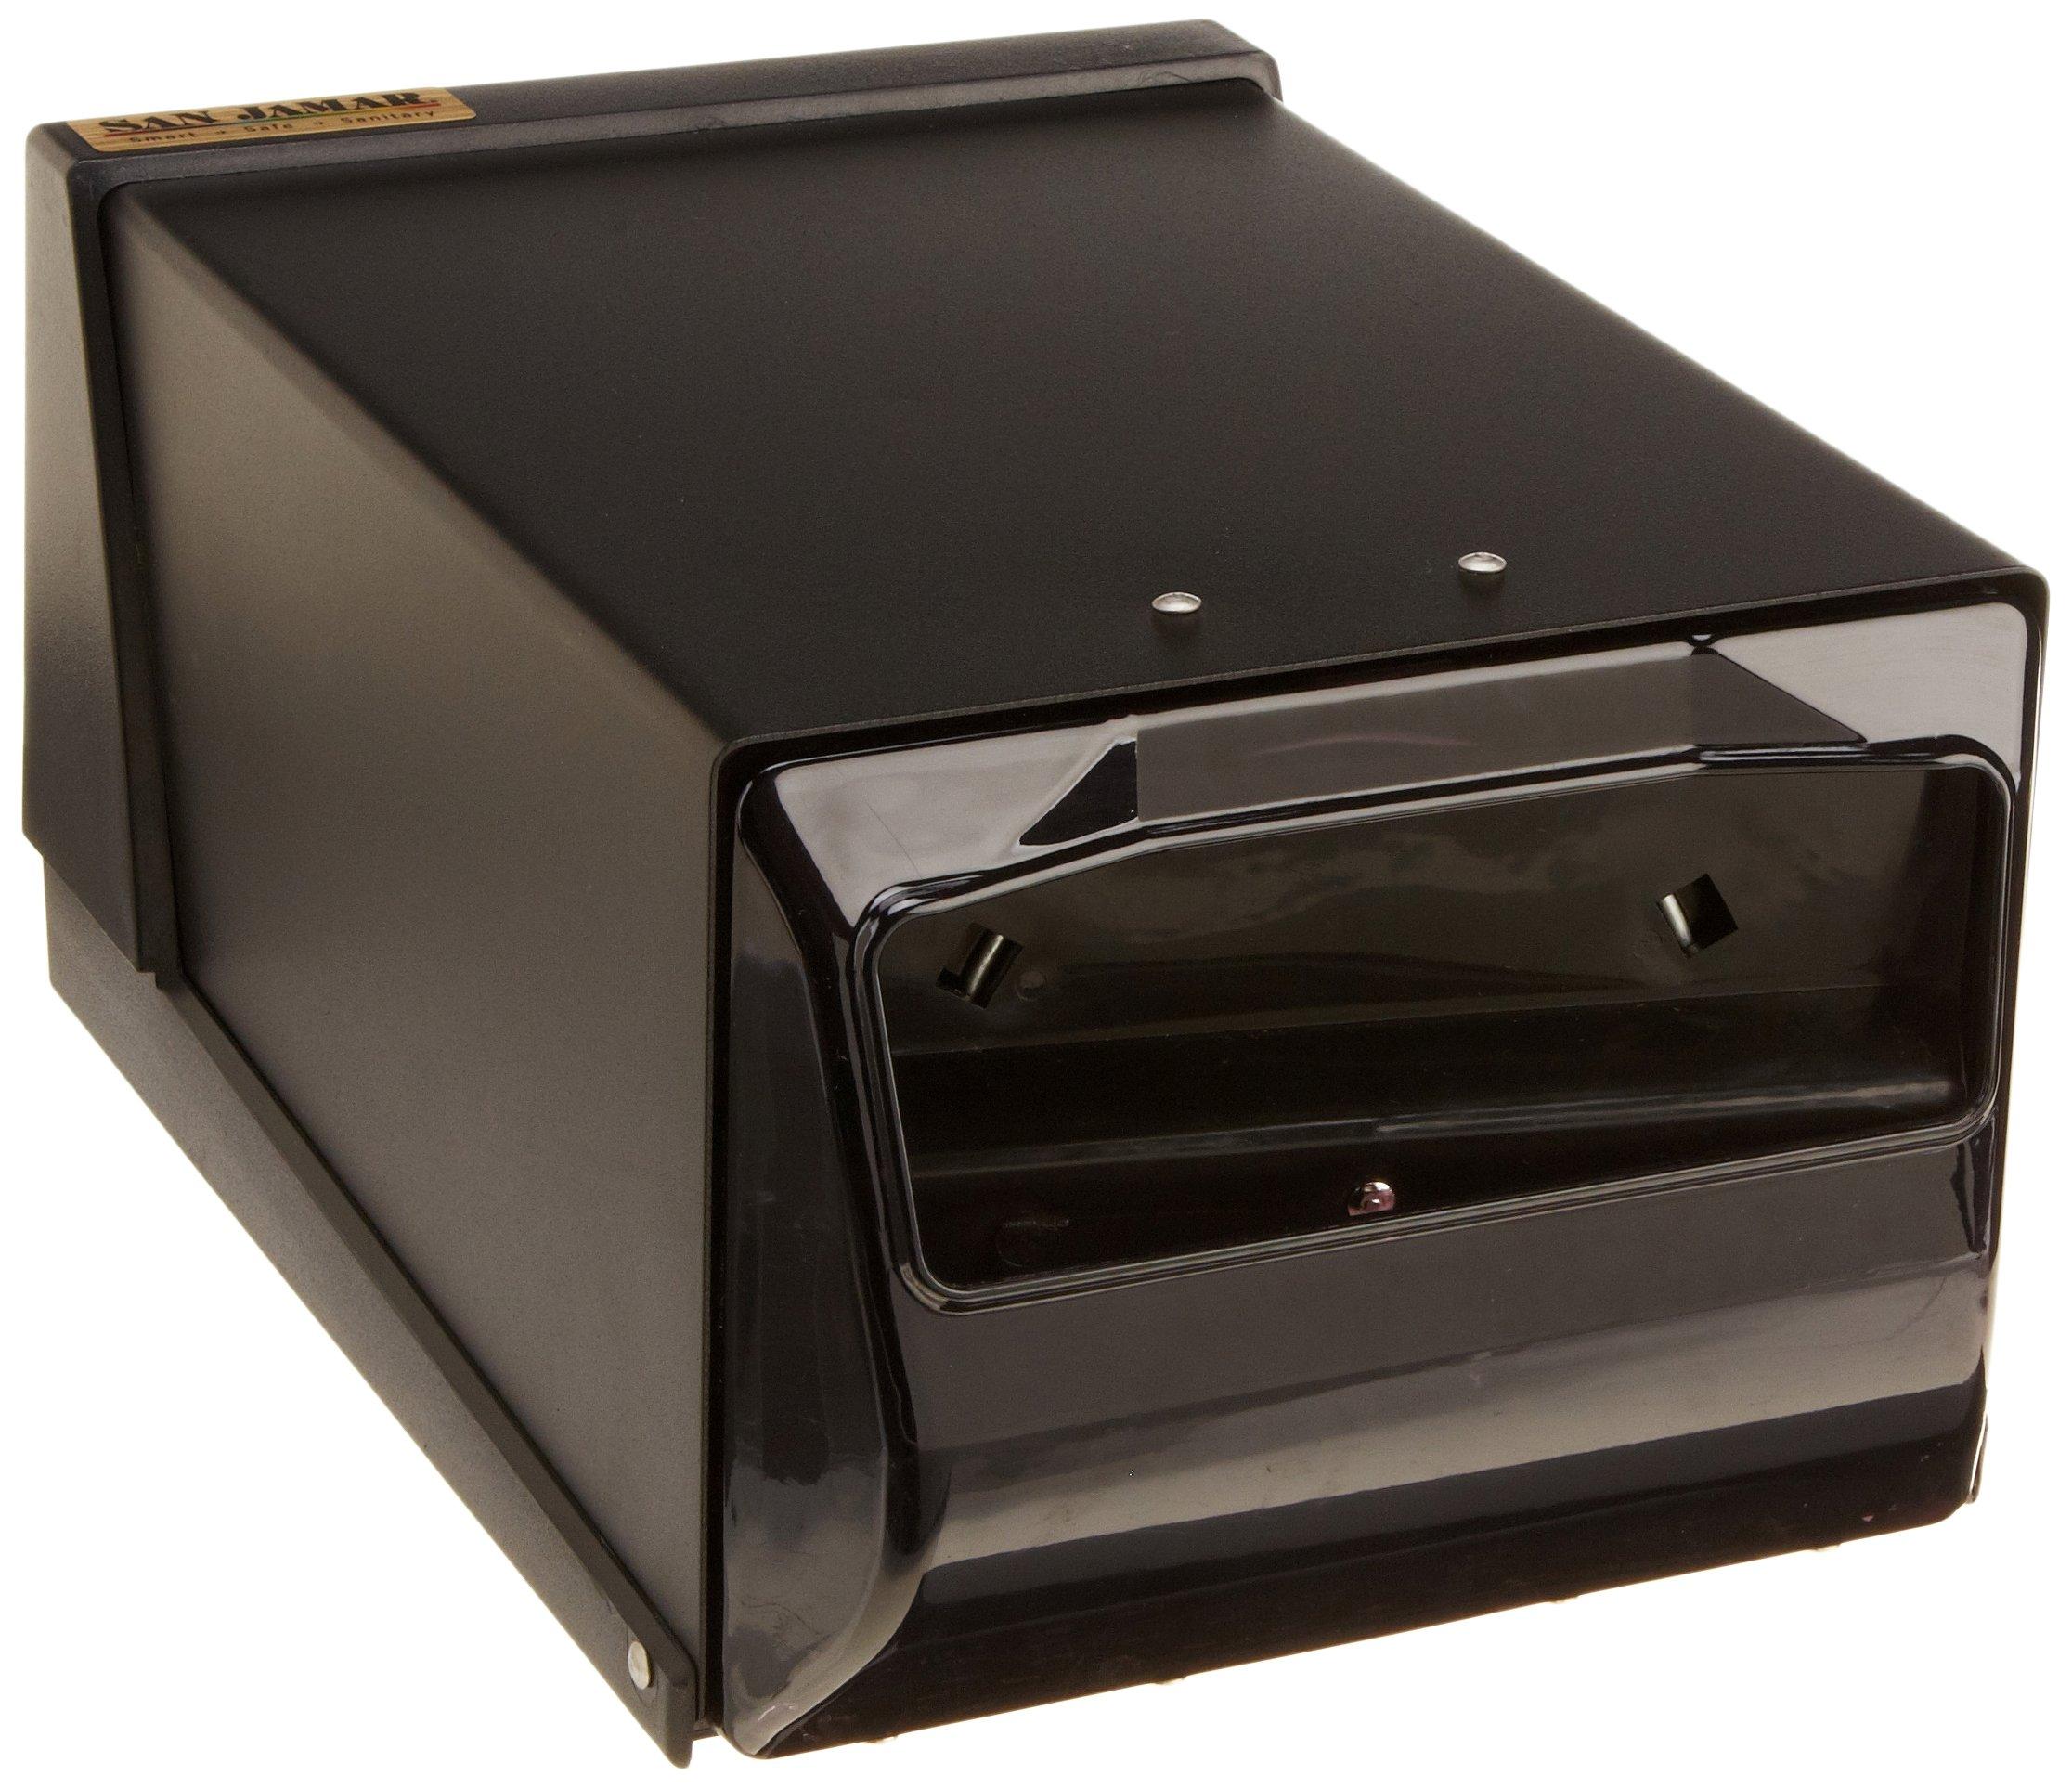 San Jamar H3001 Countertop Fullfold Napkin Dispenser, 300 Capacity, 7-5/8'' Width x 5-1/2'' Height x 11'' Depth, Black Pearl/Black